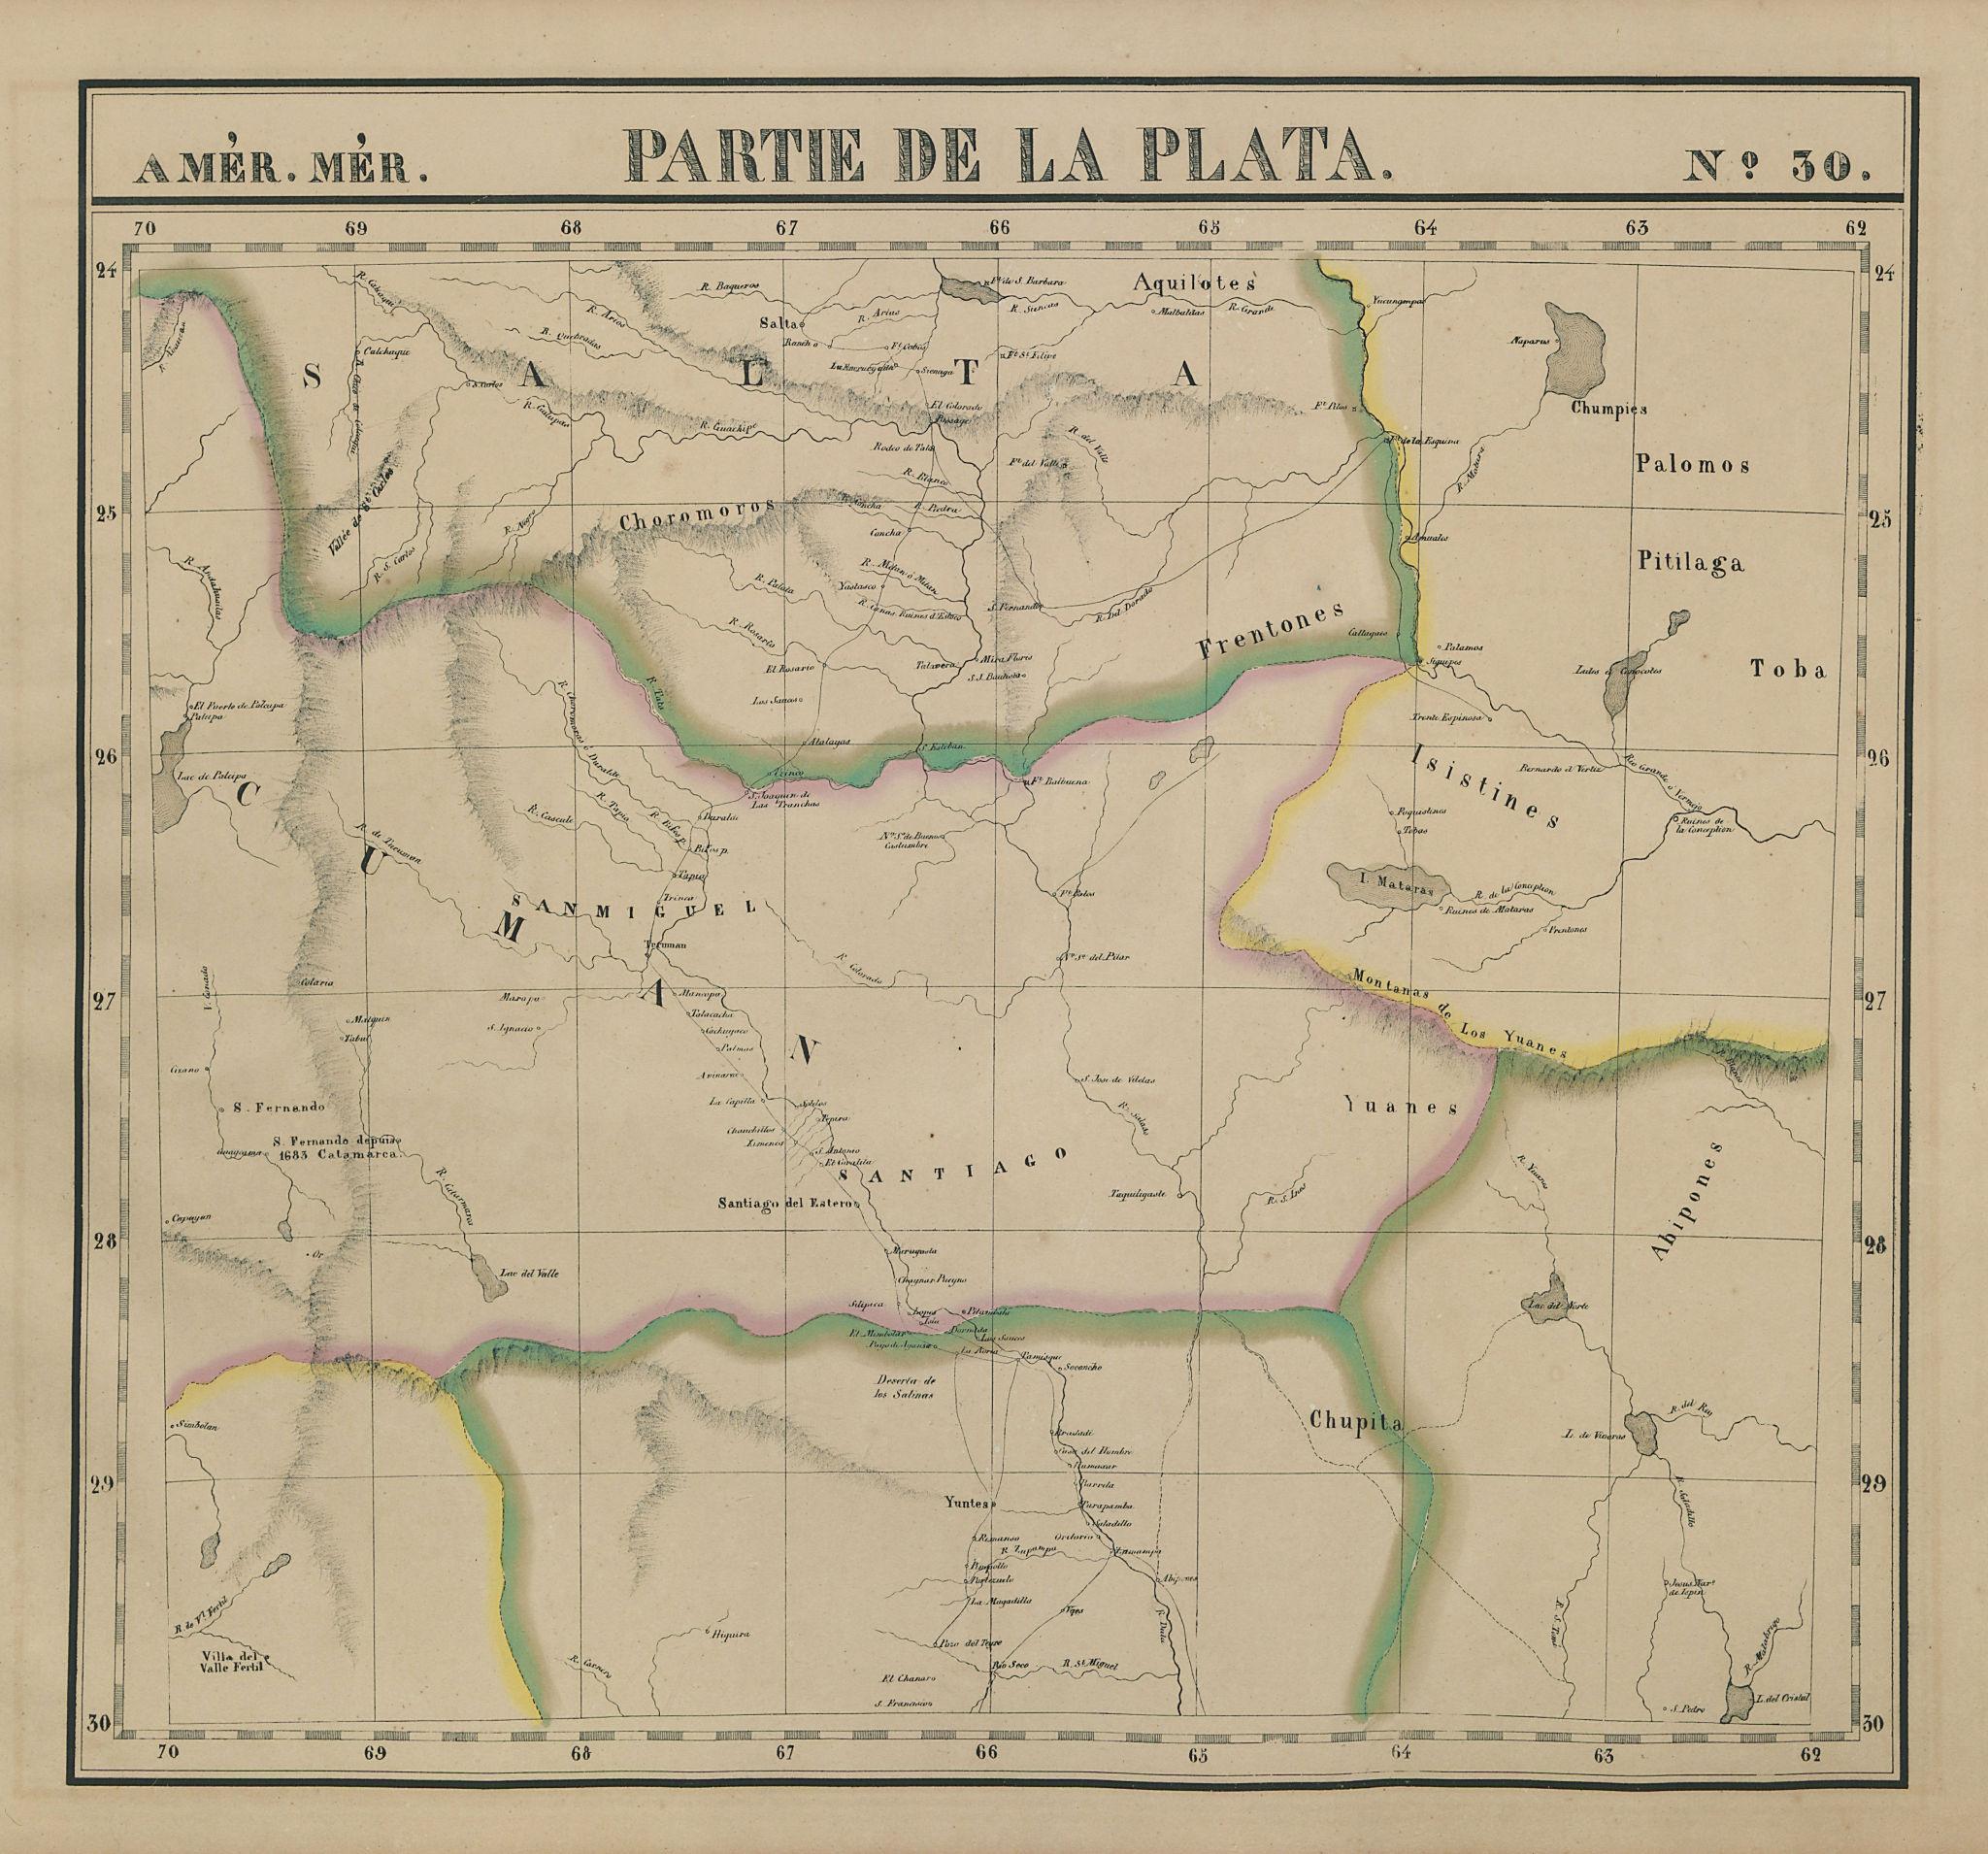 Amér. Mér. Plata #30. Northwest Argentina & Chaco. VANDERMAELEN 1827 old map